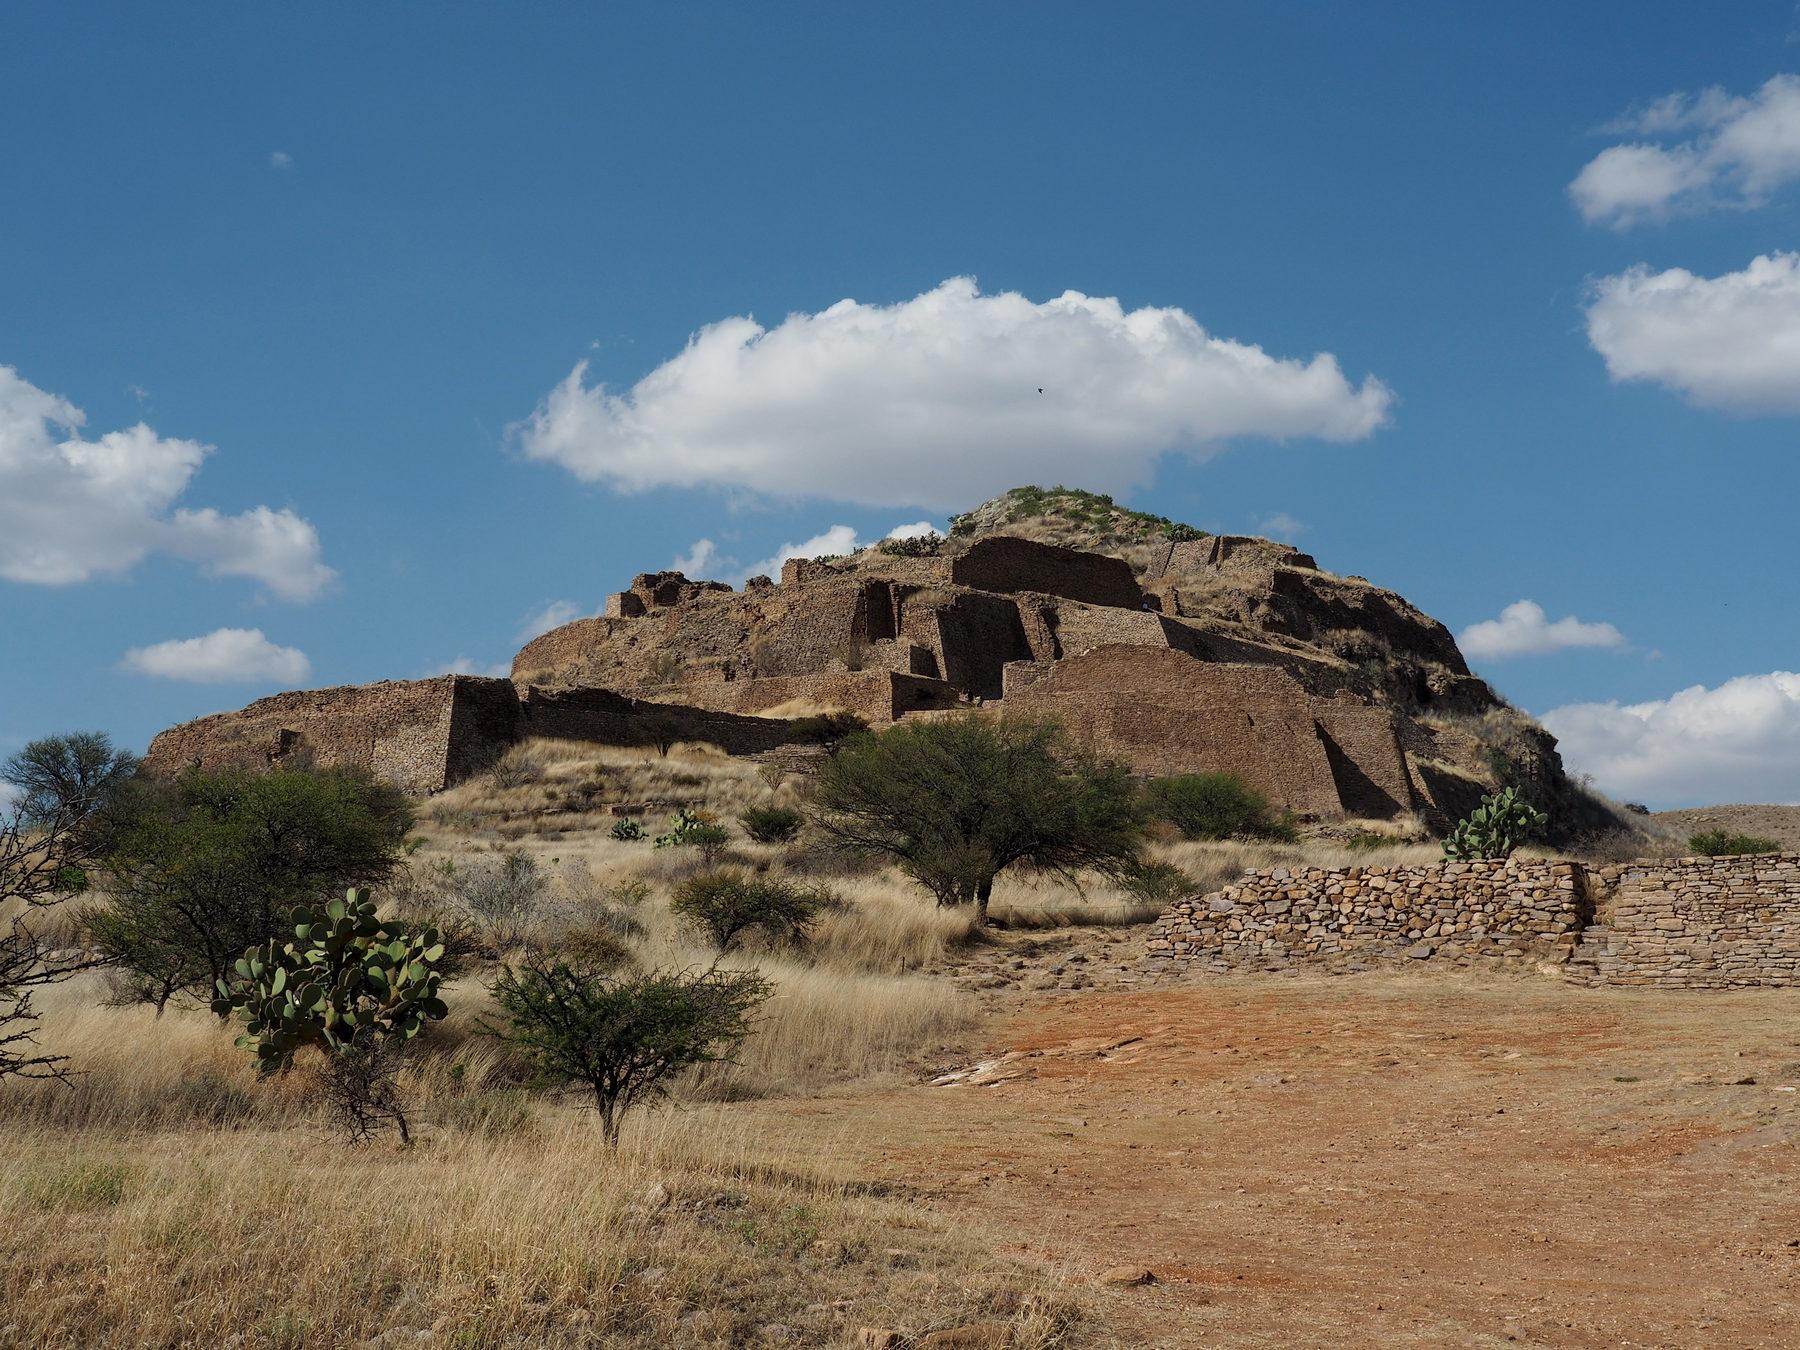 Quemada - Hinterlassenschaft der Azteken ...